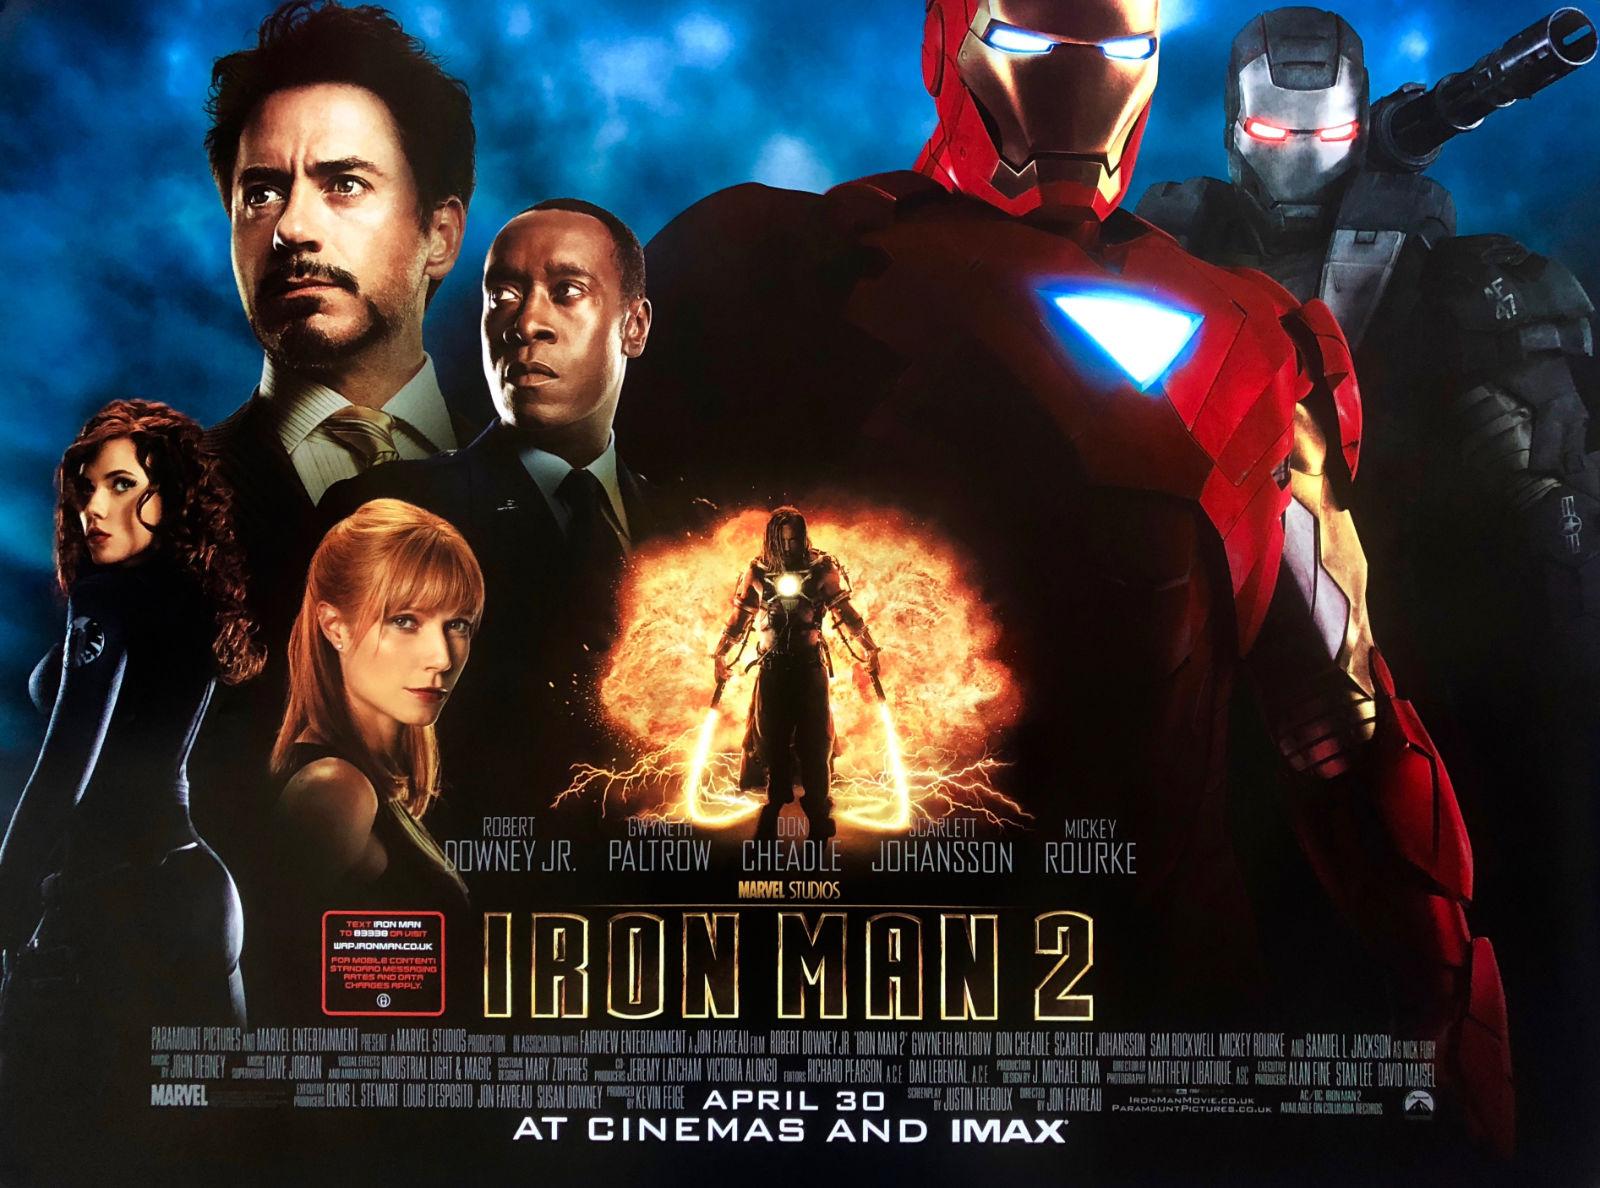 Notes On A Film: Iron Man 2